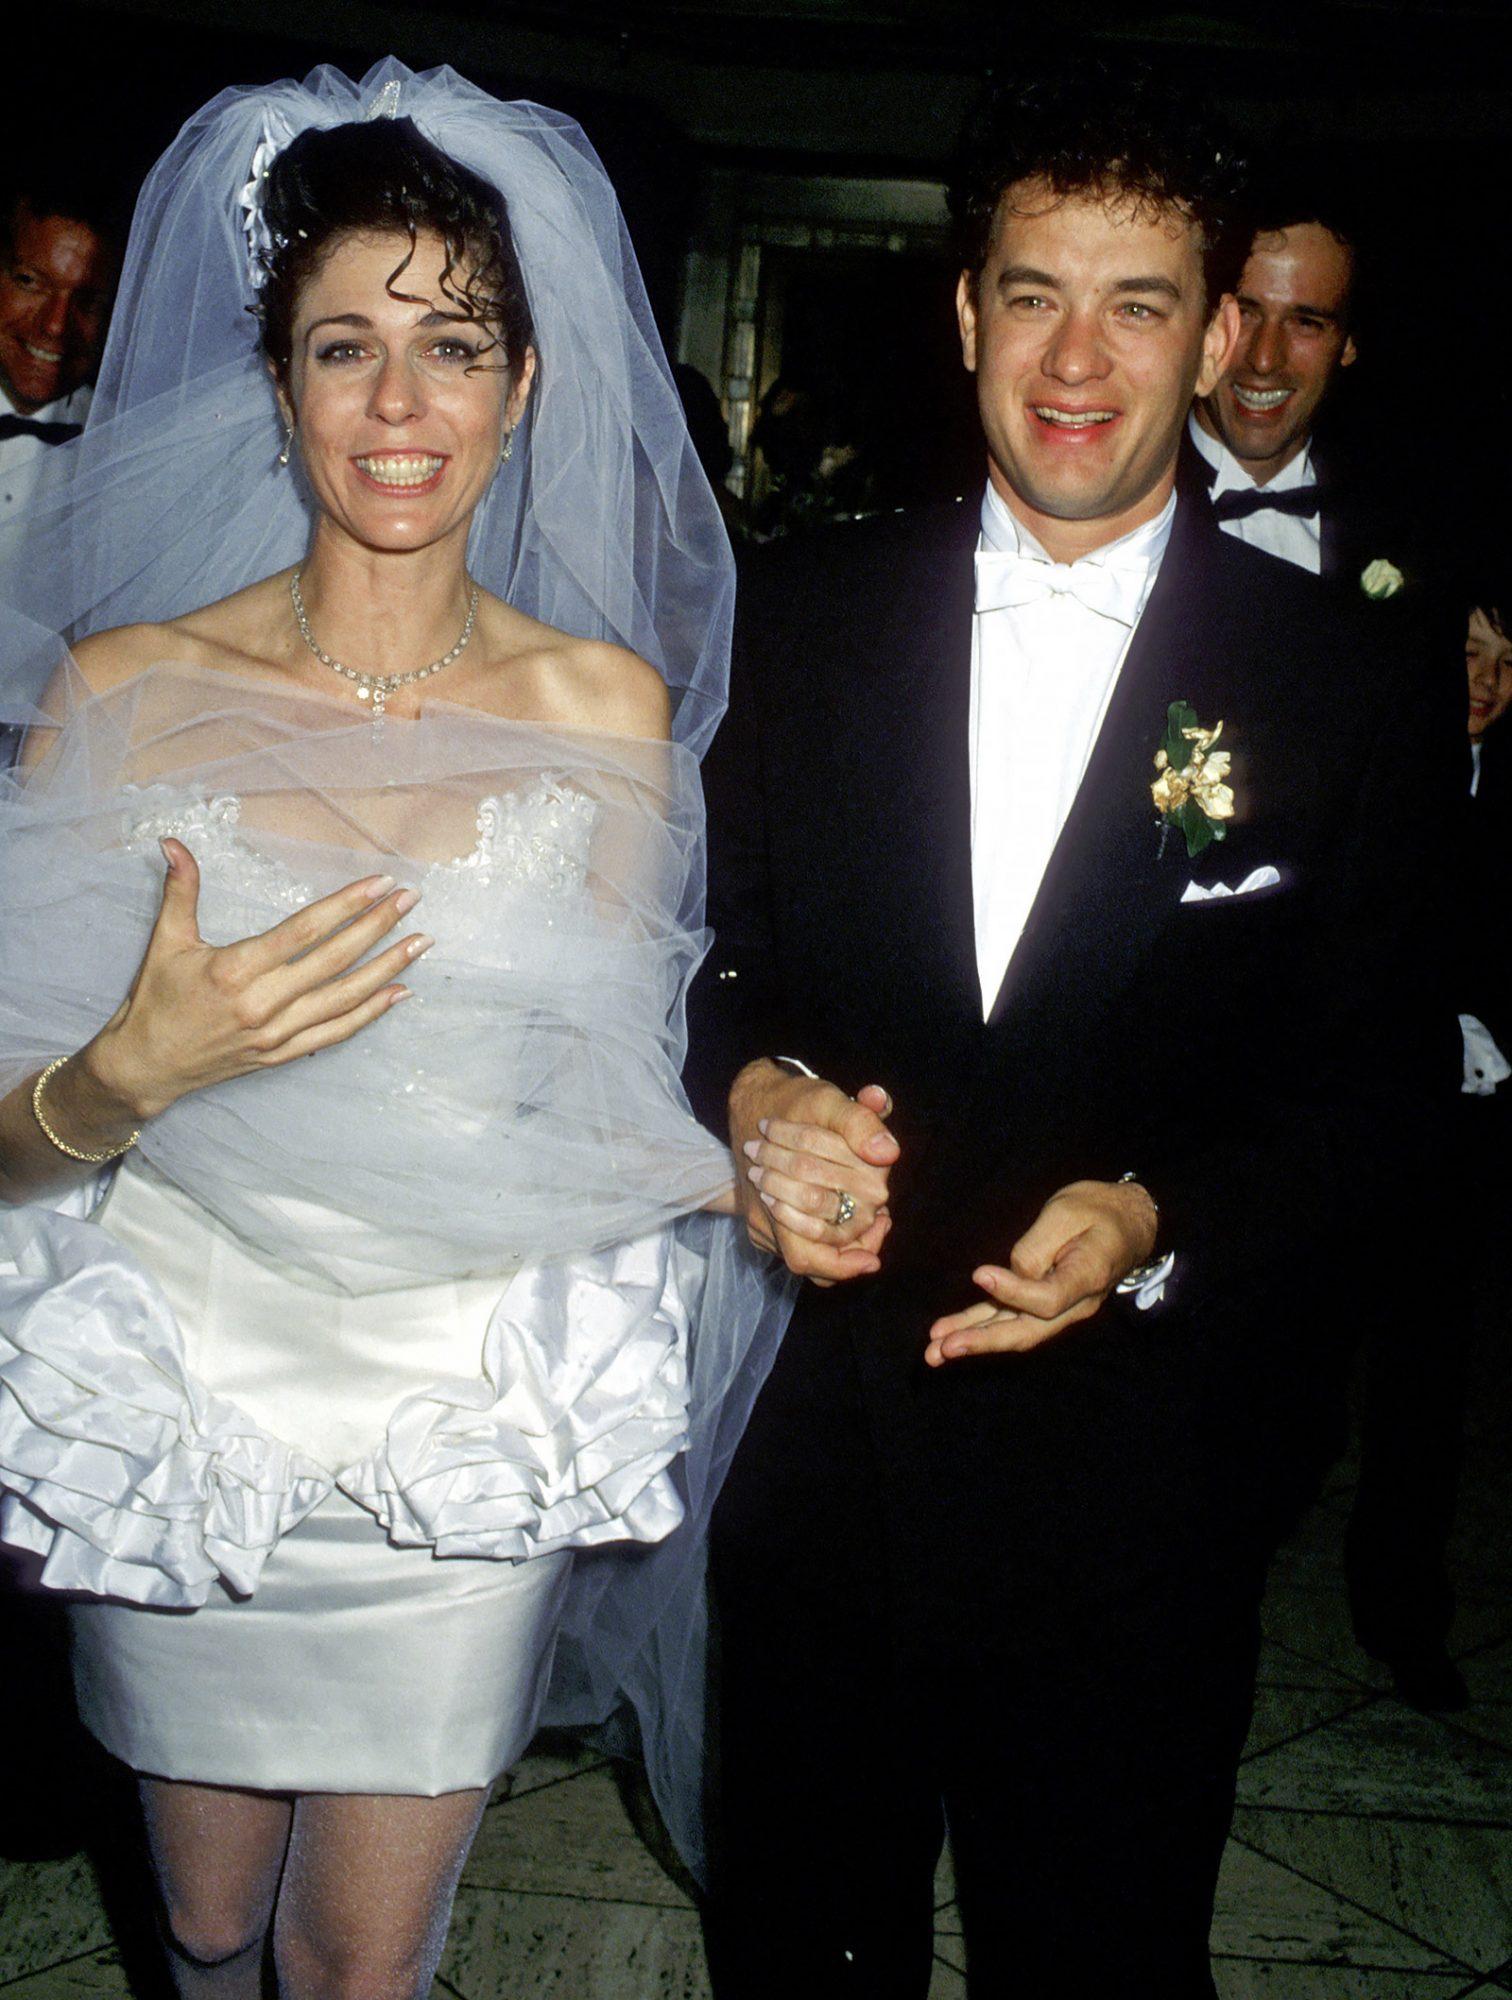 Tom Hanks and Rita Wilson Wedding Reception